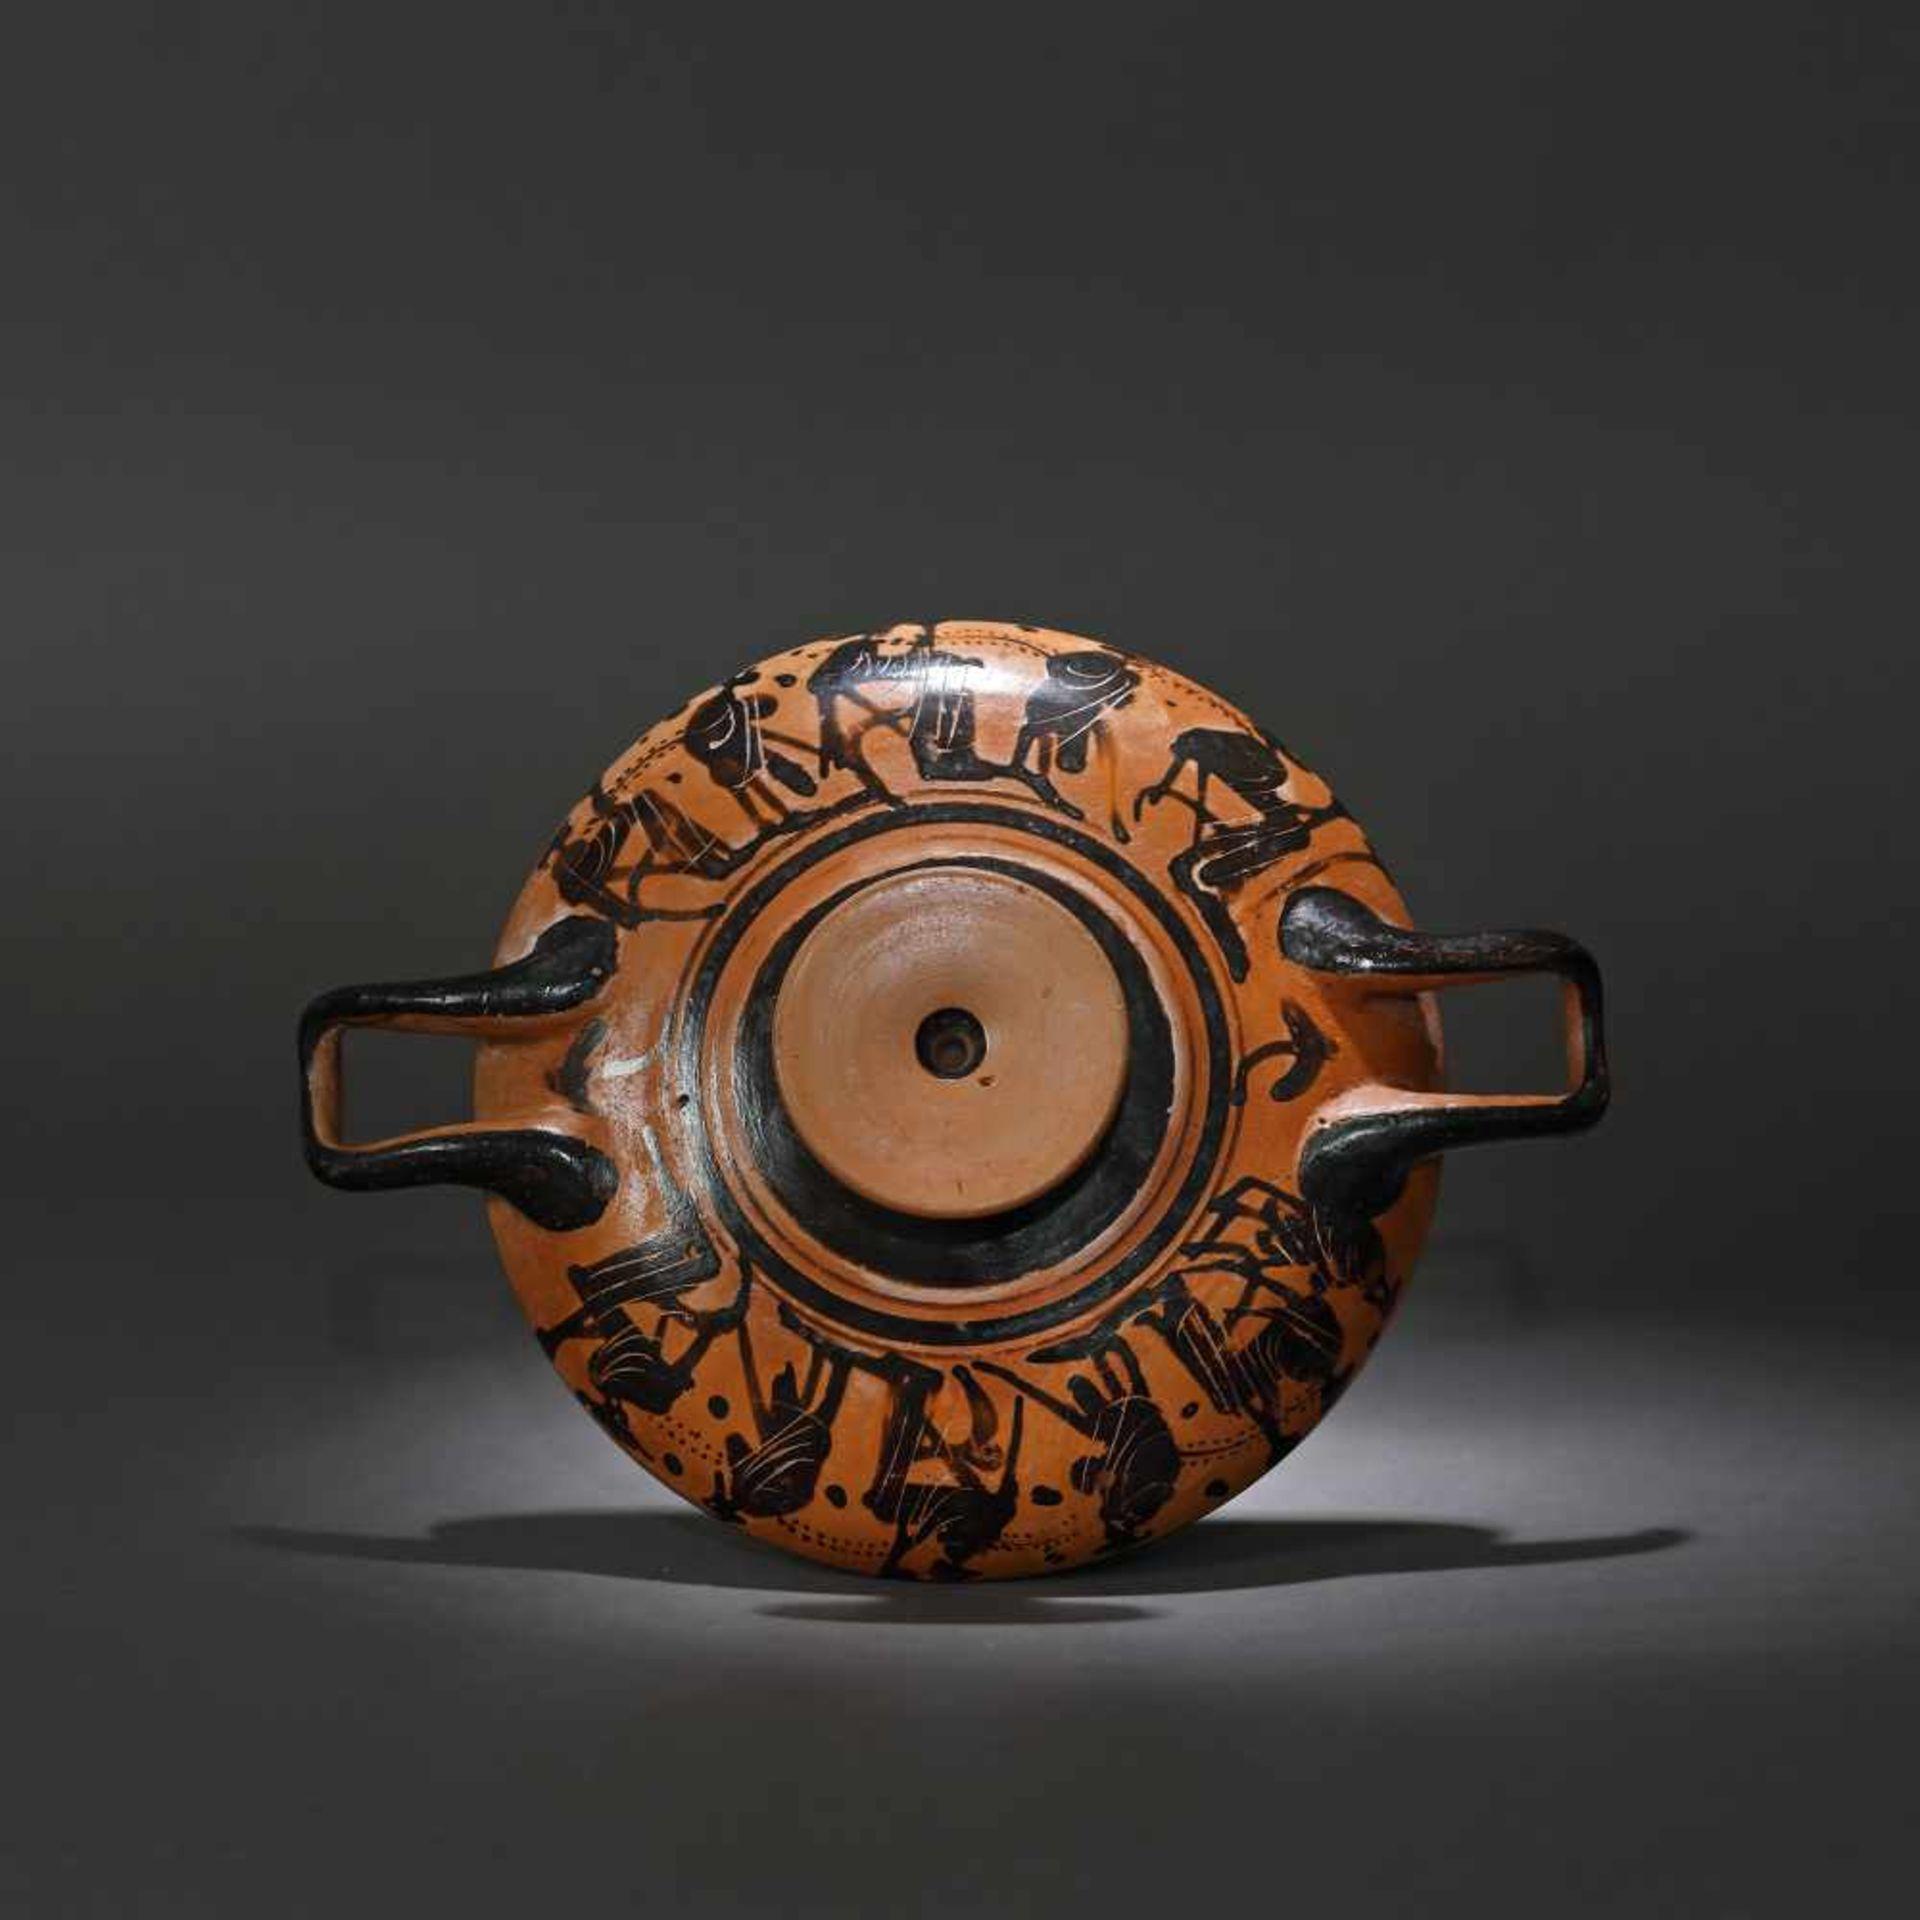 Kylix - ceramic wine jug, black-figure style, Classical Greece, approx. 2,400 years old, 4th century - Bild 2 aus 7